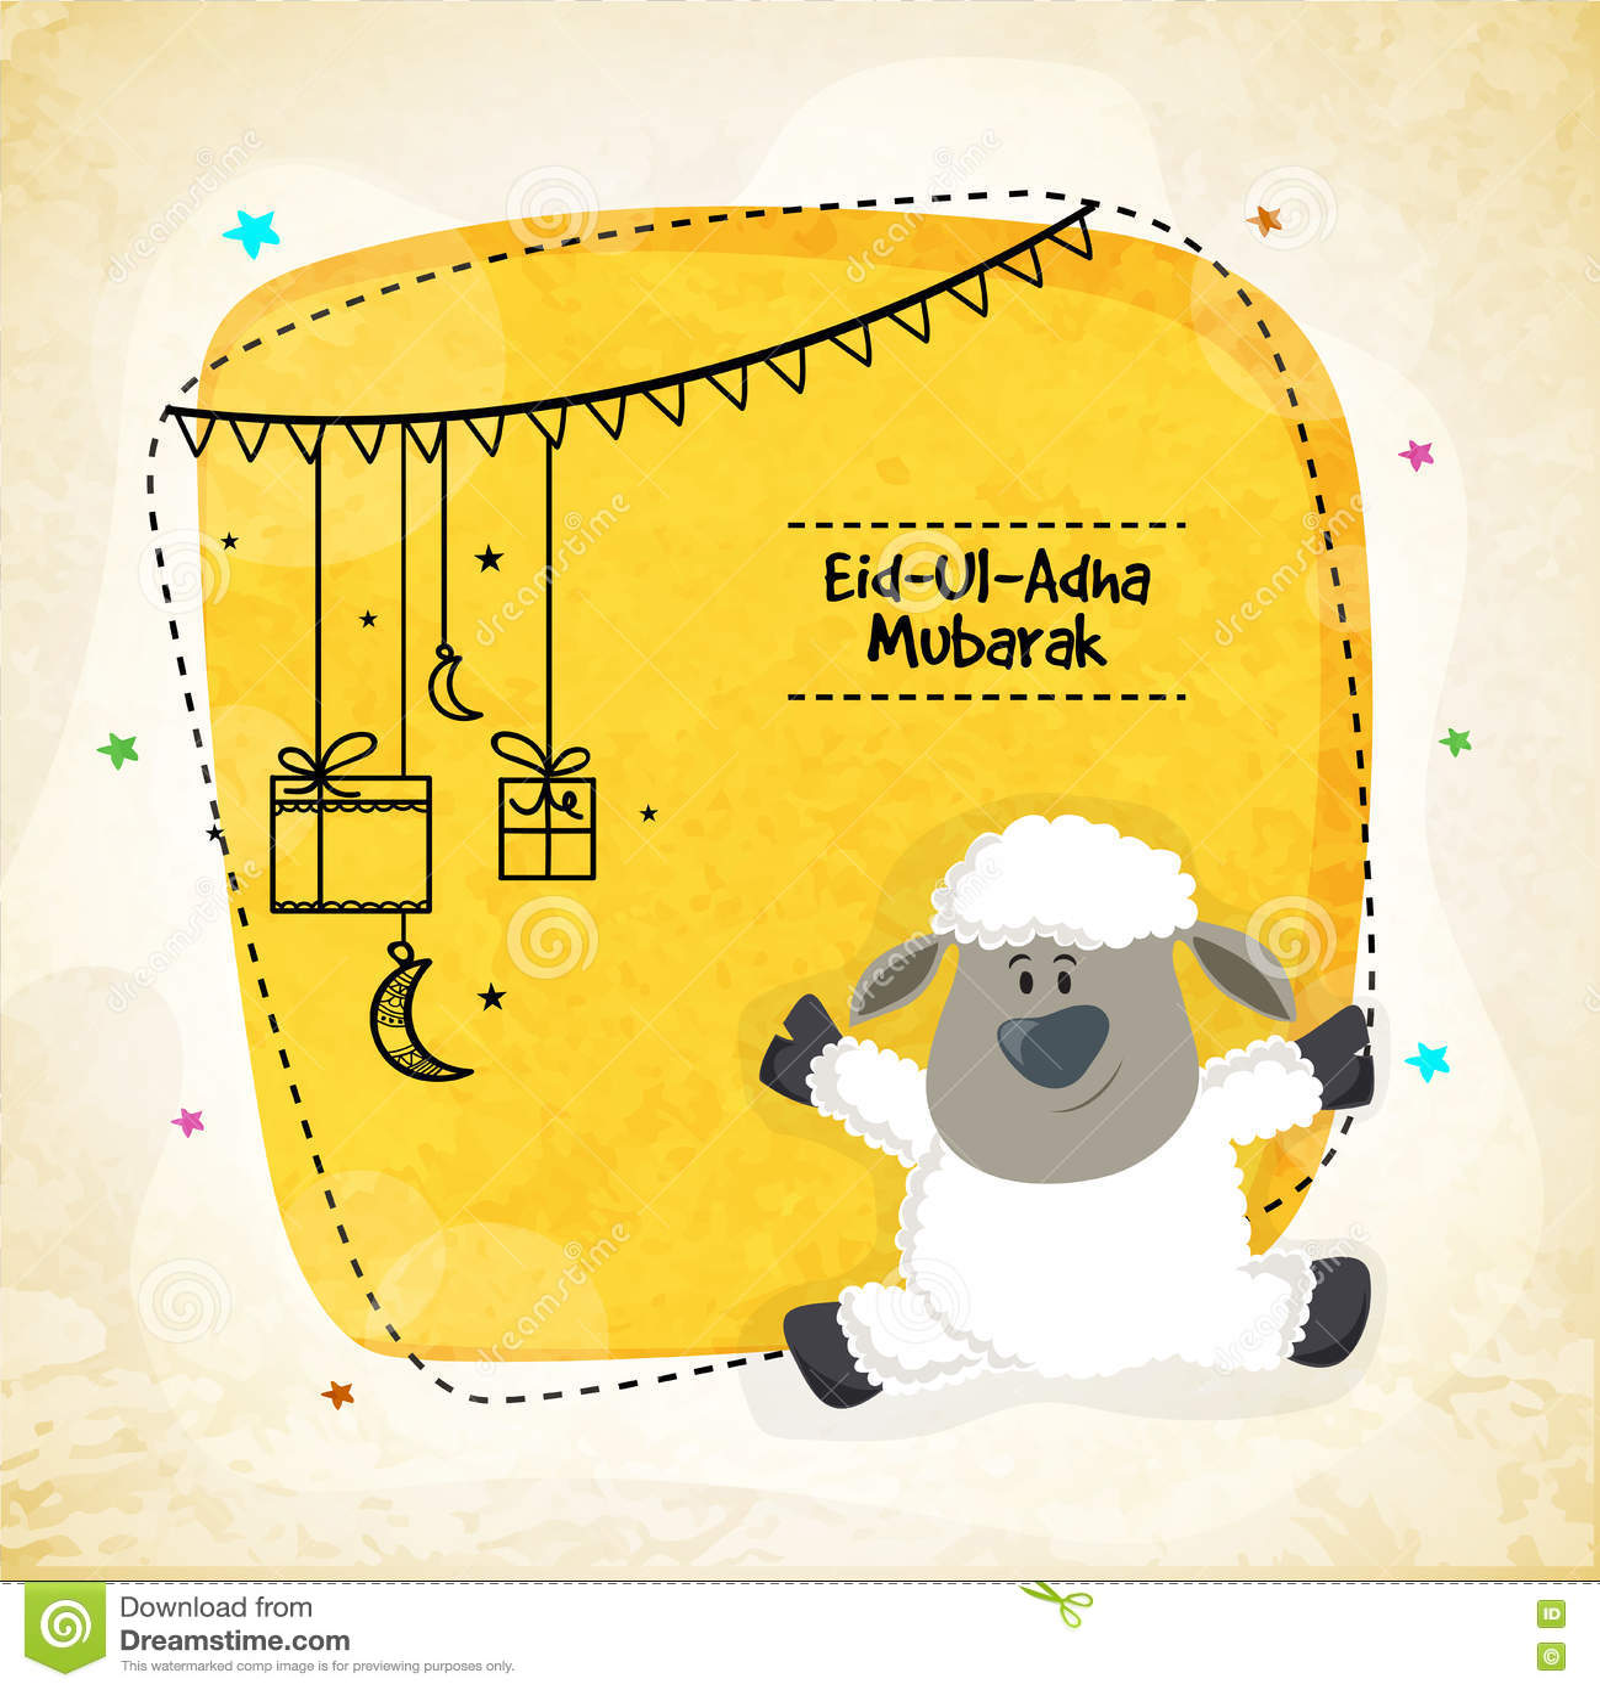 Greeting card for eid al adha mubarak stock illustration download greeting card for eid al adha mubarak stock illustration illustration of m4hsunfo